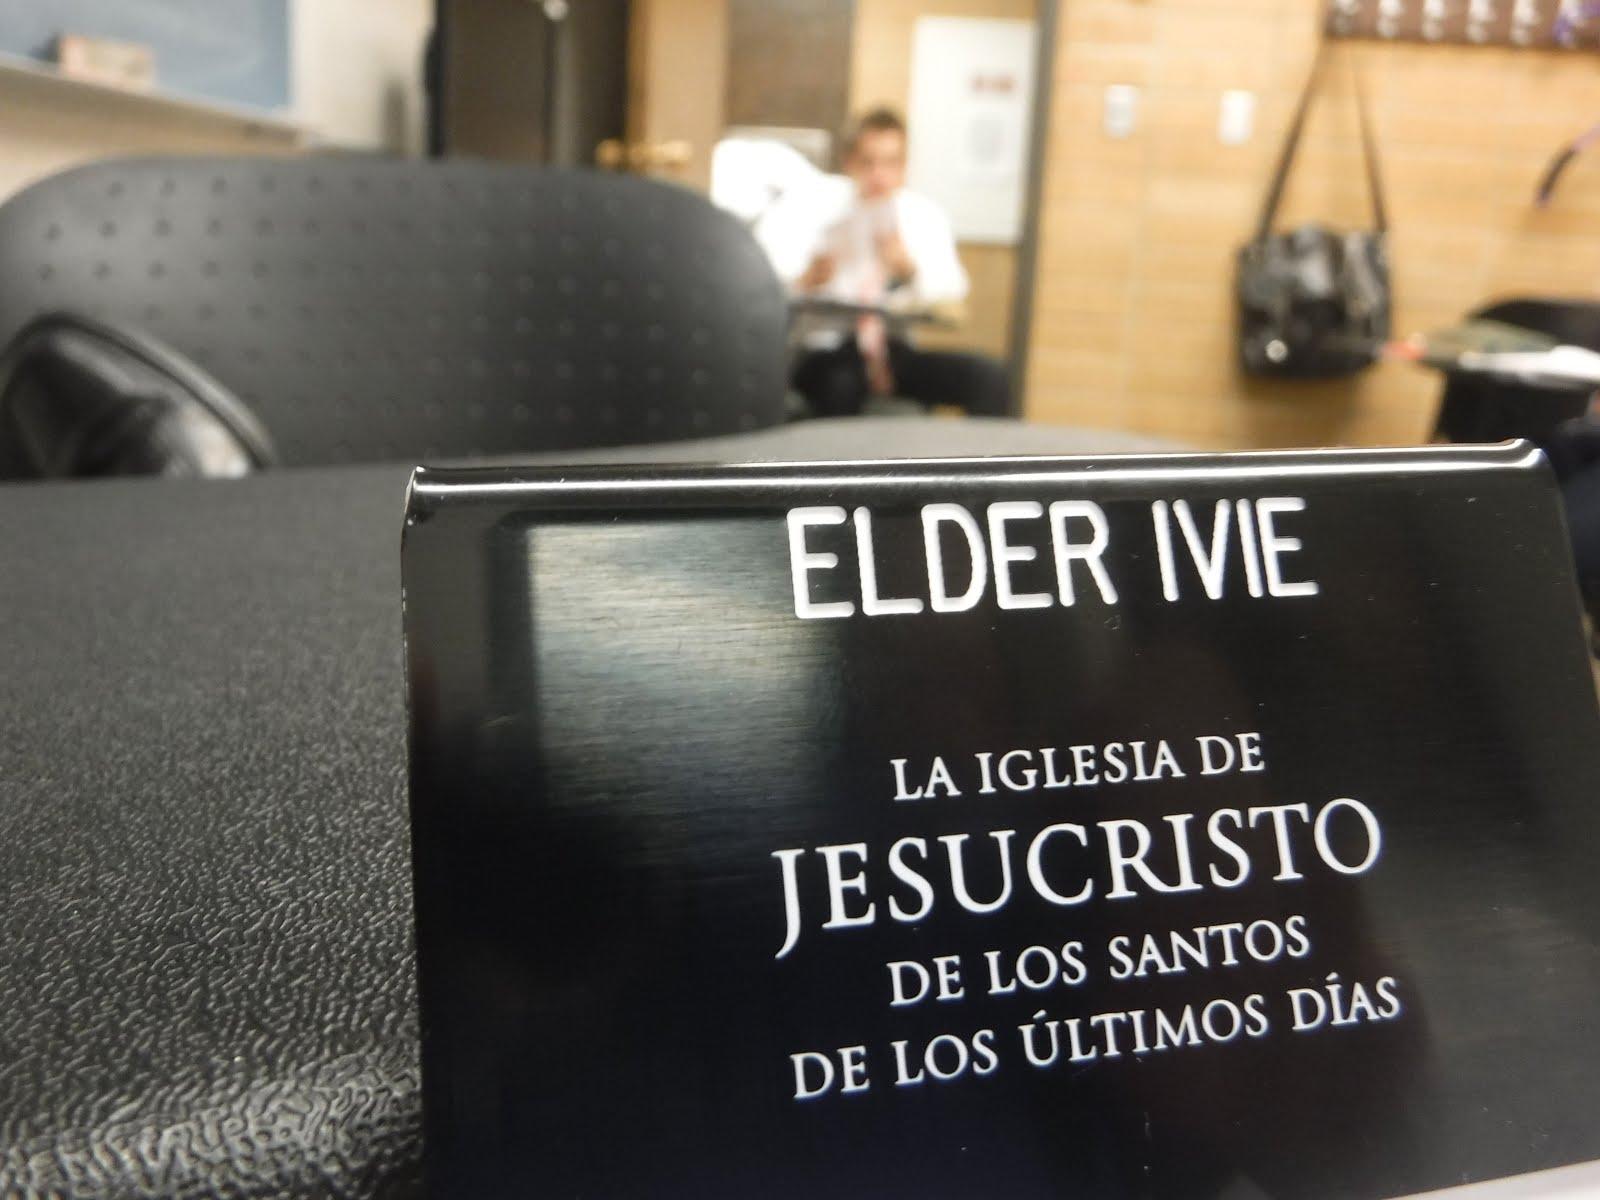 Elder Ivie